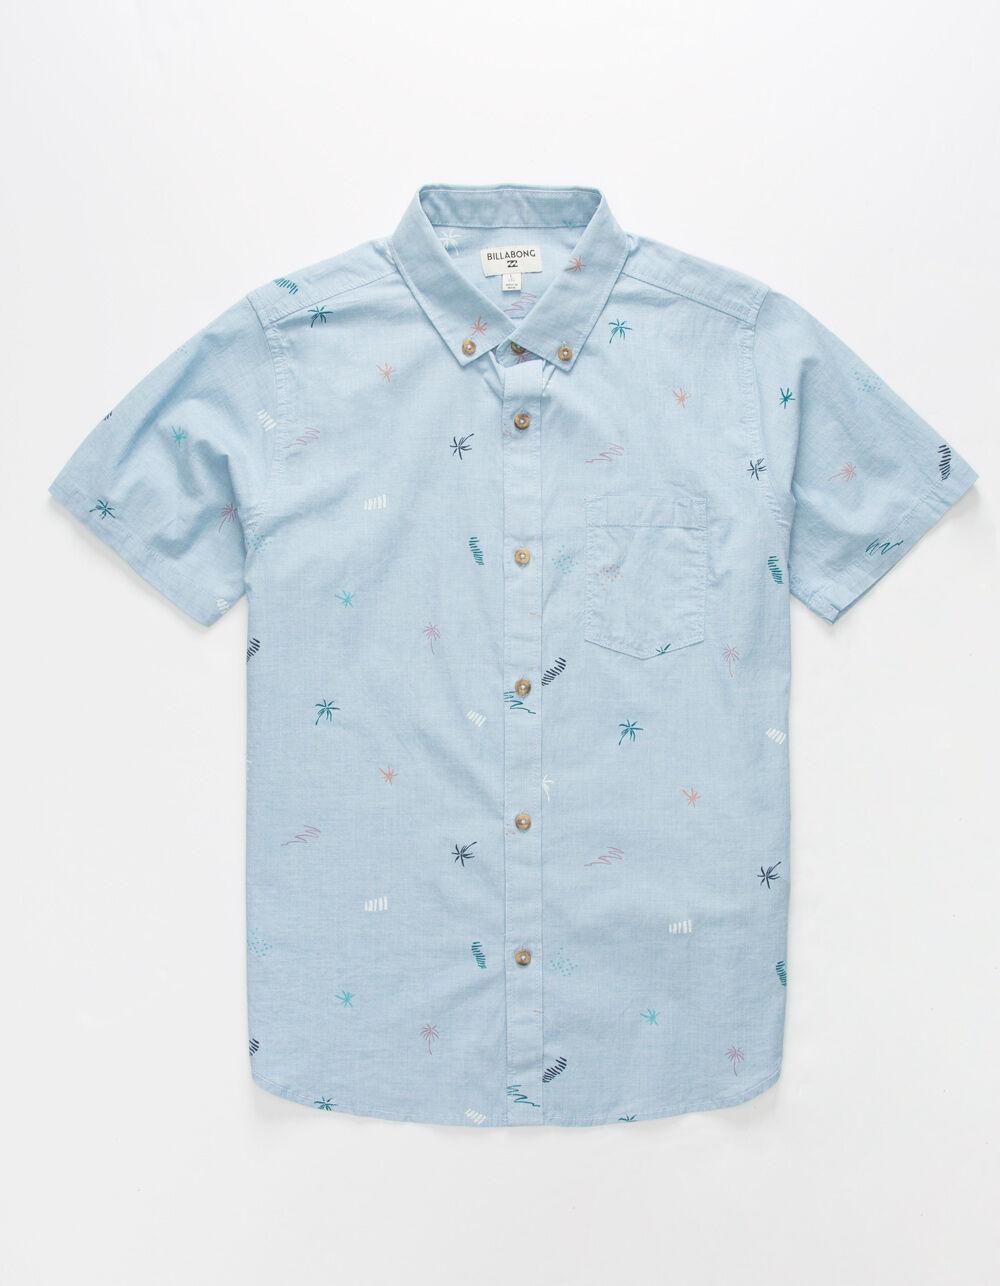 BILLABONG Sundays Mini Blue Boys Shirt